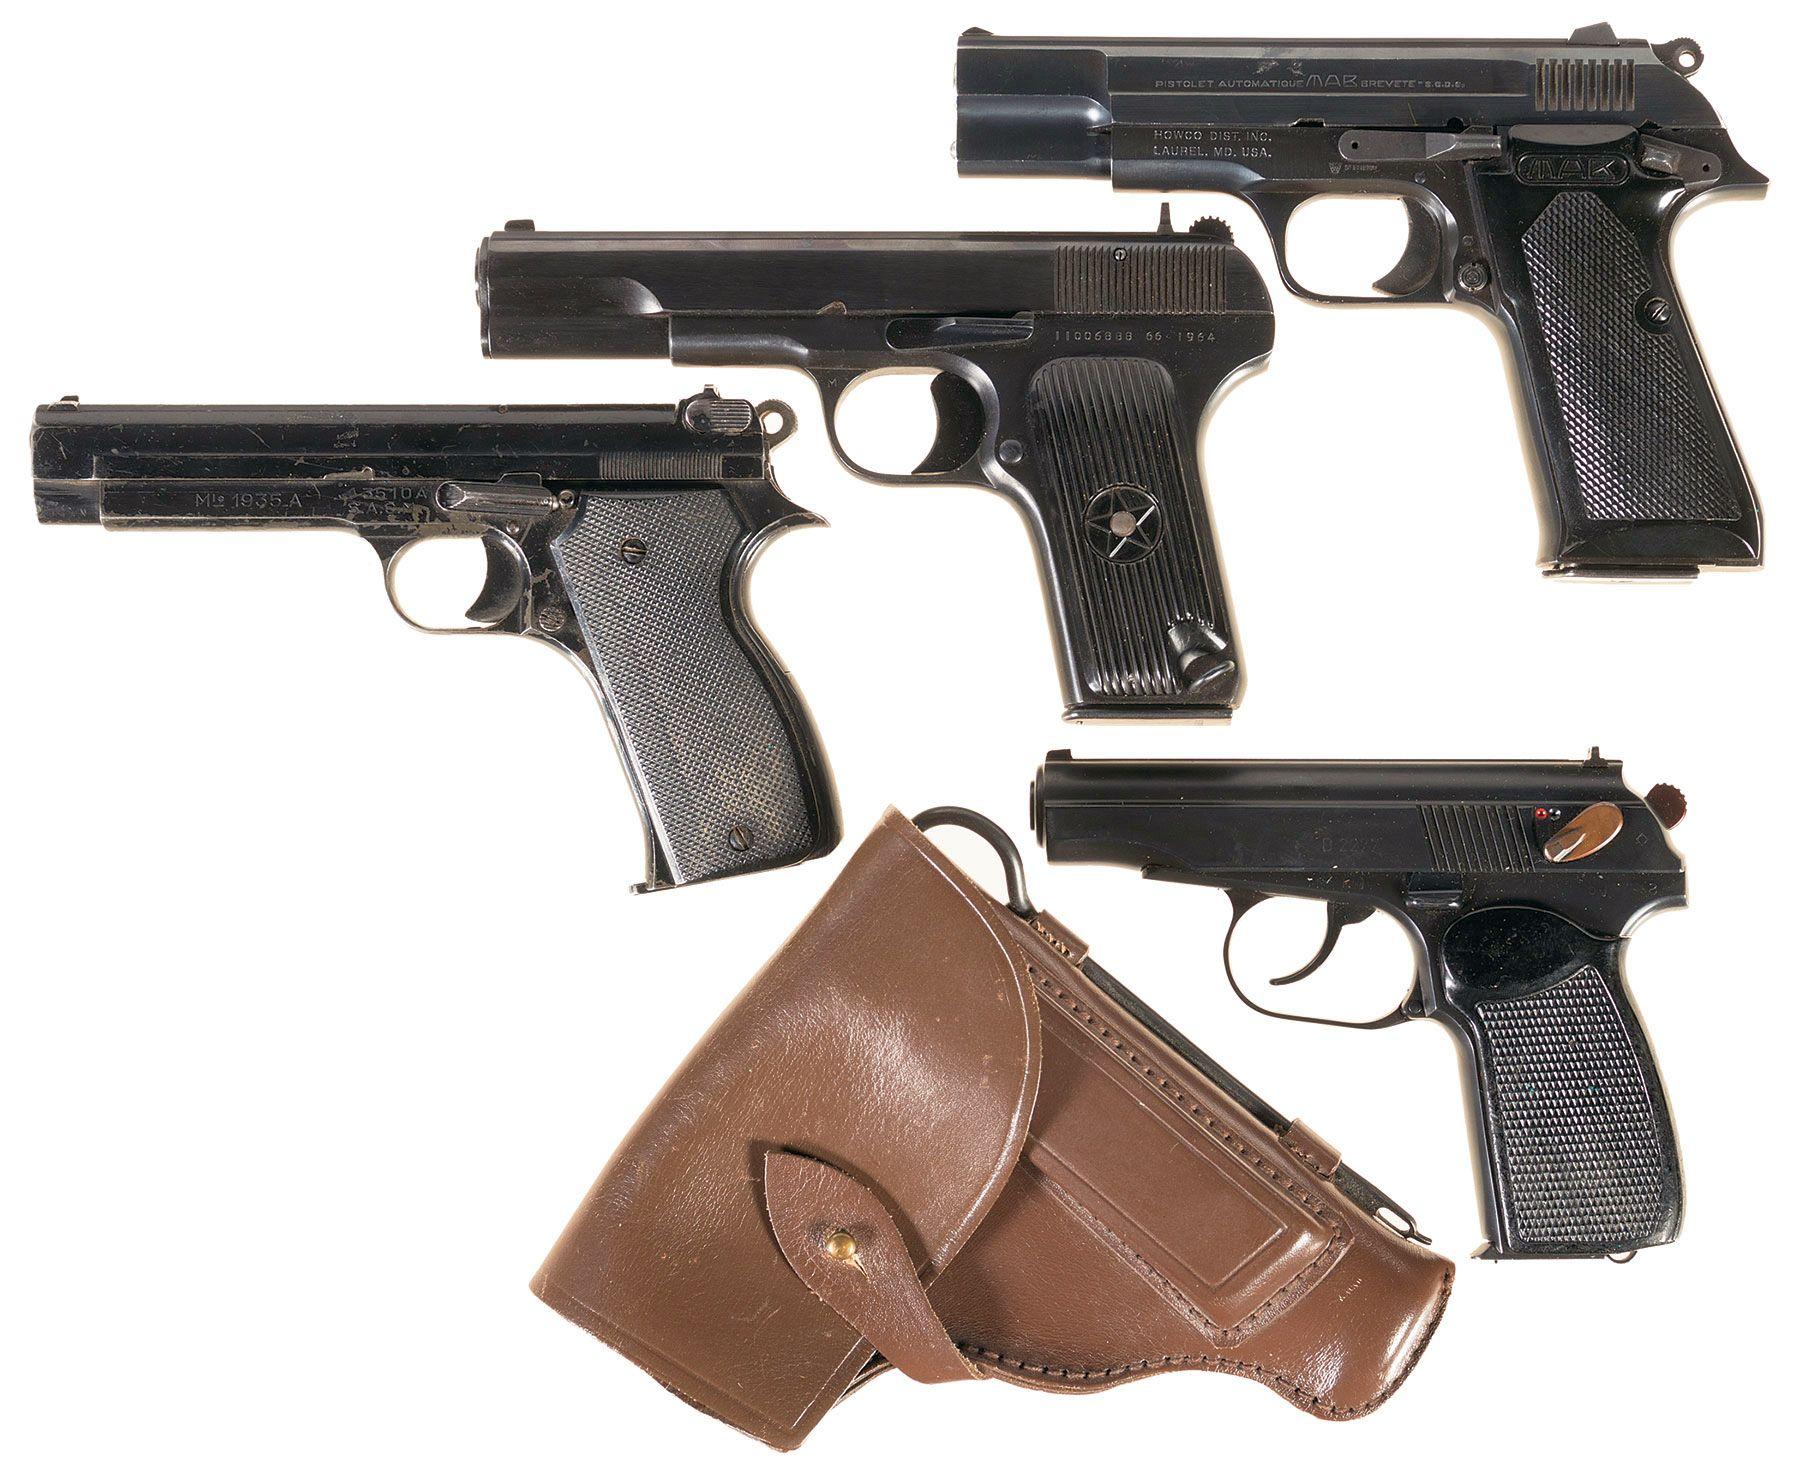 Four Semi-Automatic Pistols -A) French M A B  Model PA-15 Pistol